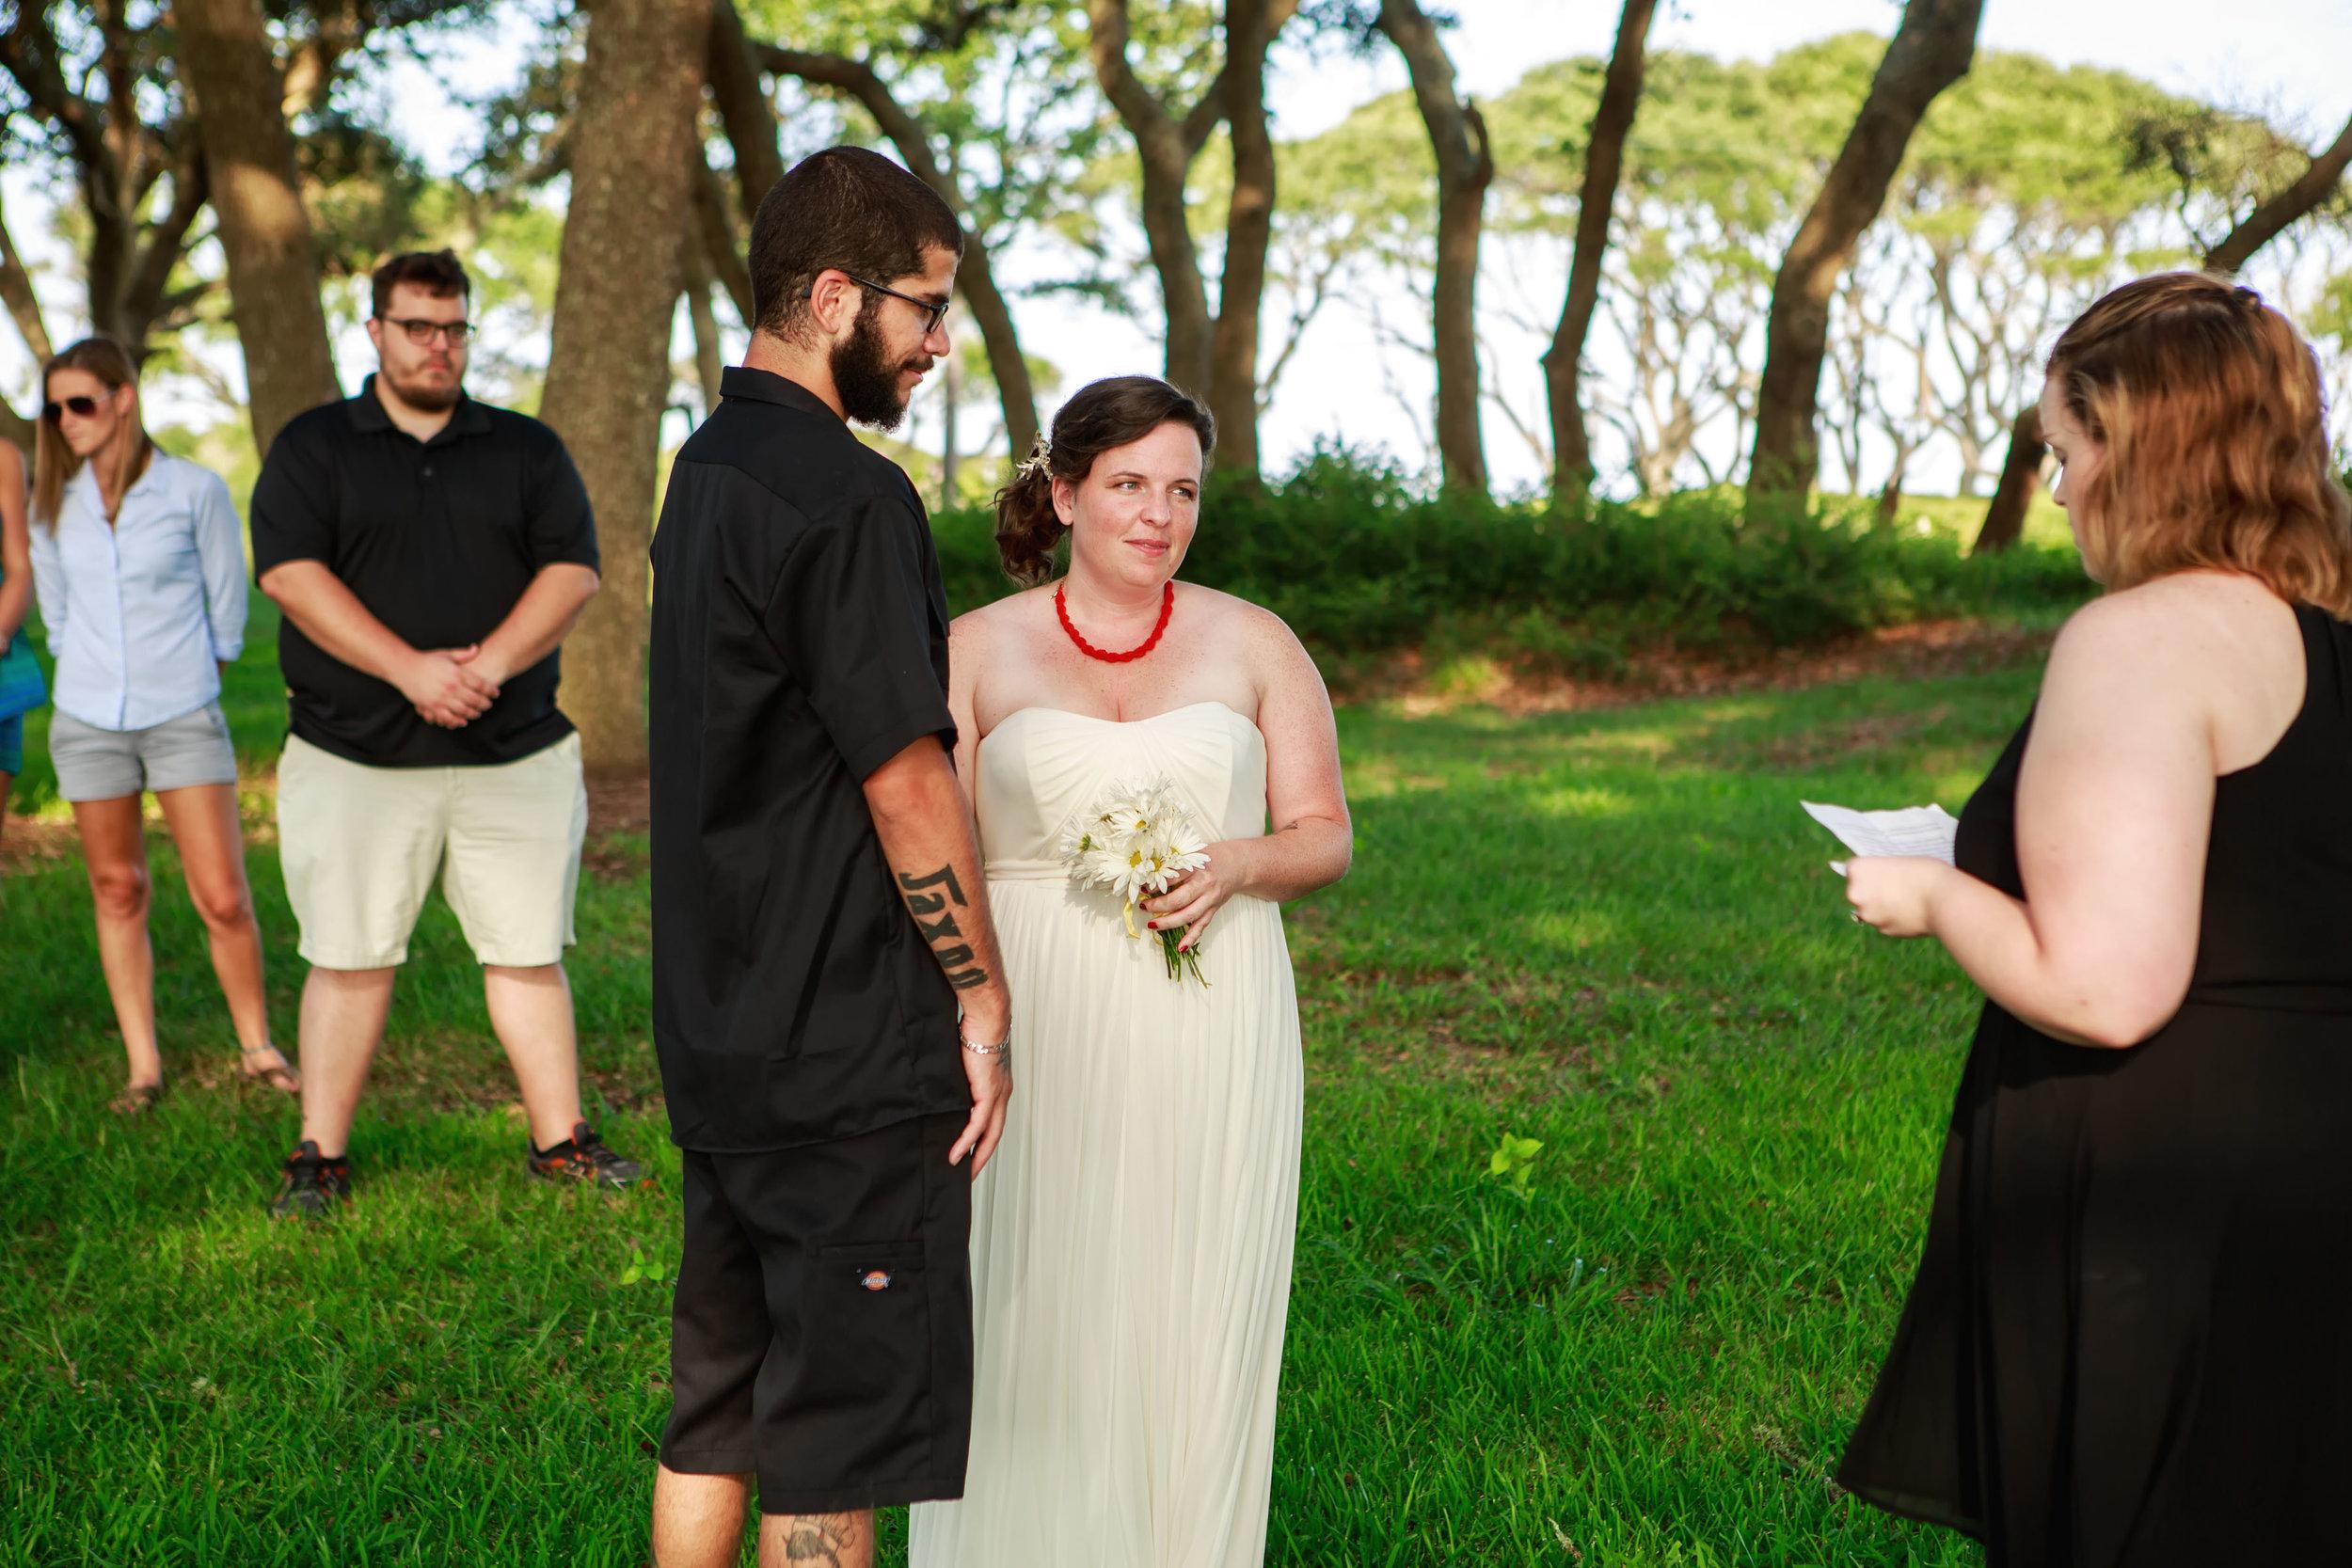 Fort_Fisher_Wedding_Photographer_Tiffany_Abruzzo_12.jpg